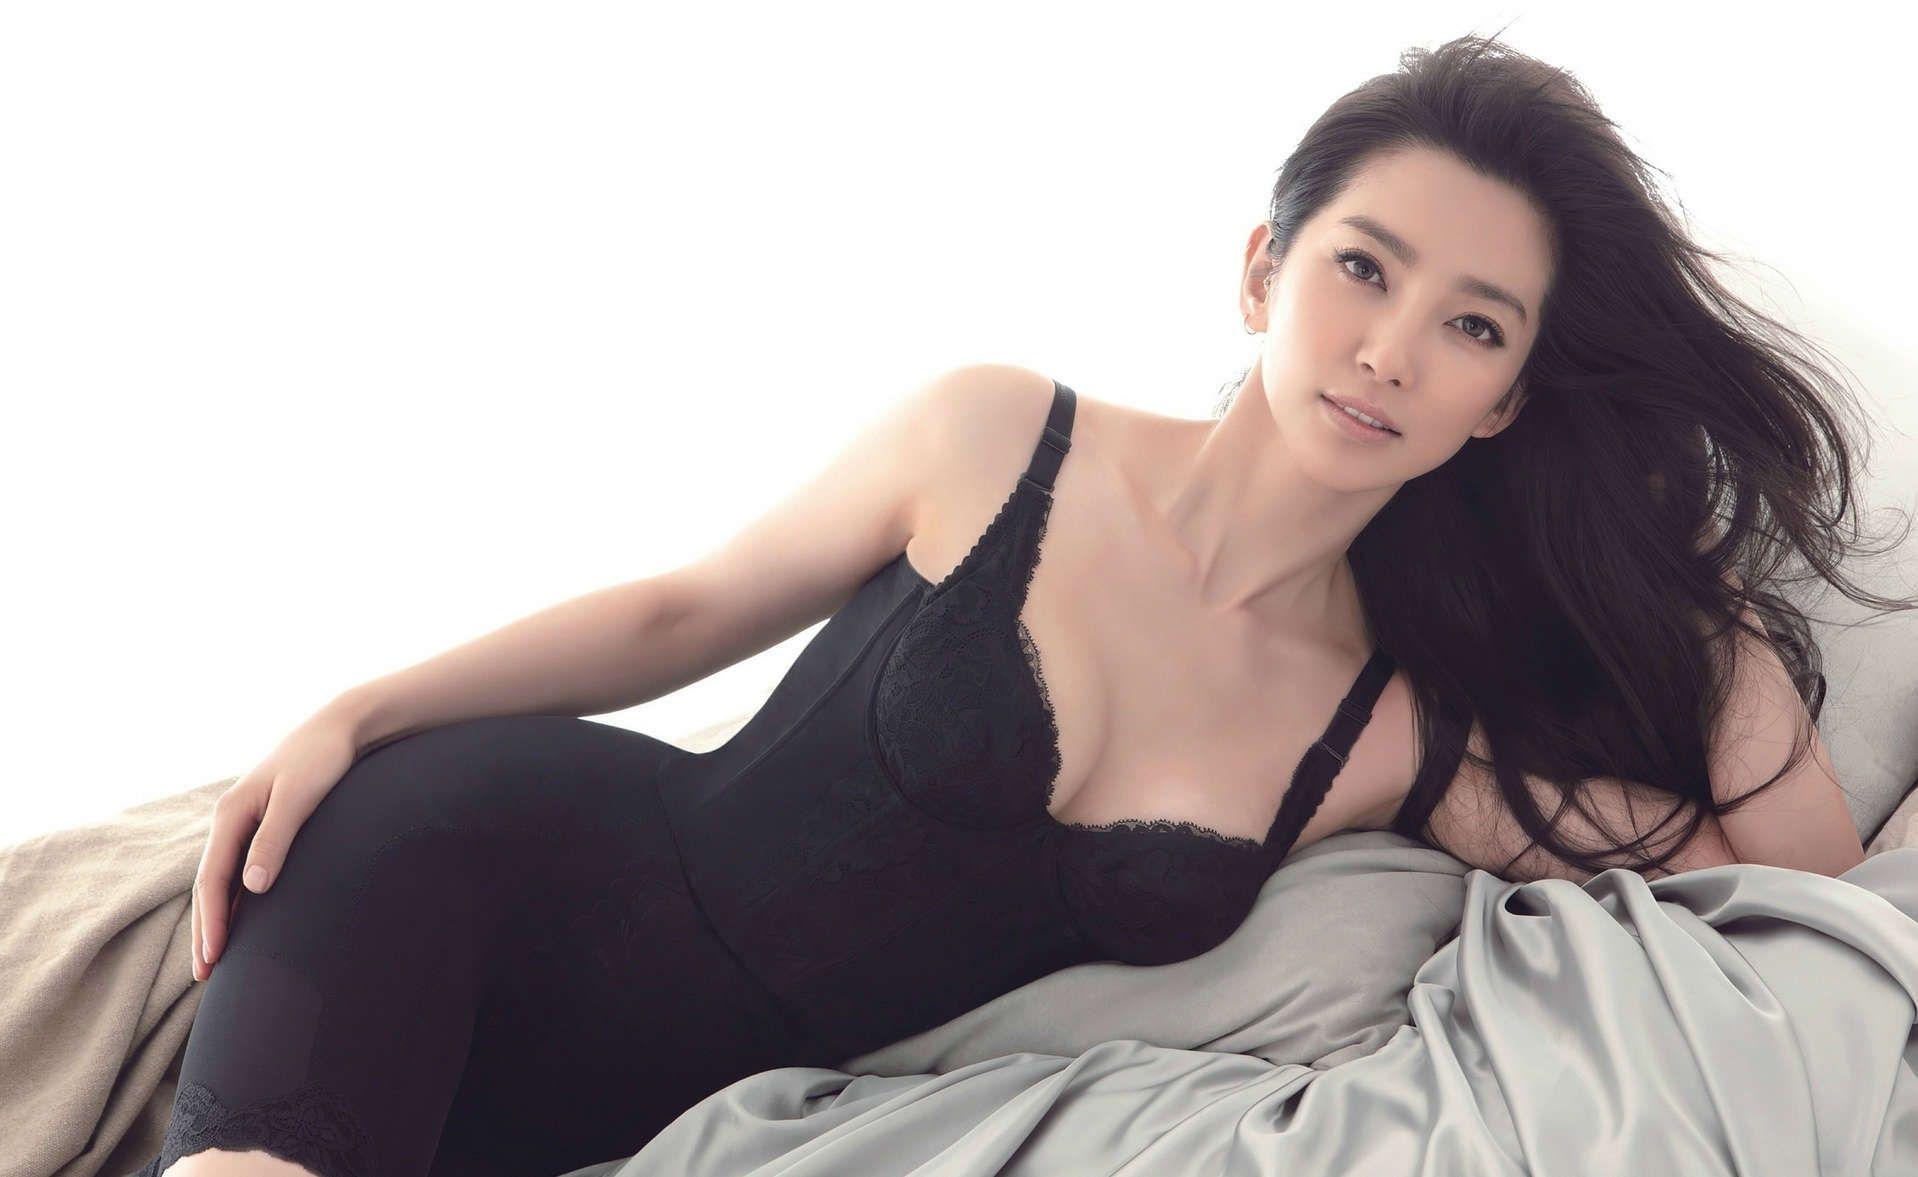 fan bingbing #fanbingbing #hot #sexy #babes | female celebrities